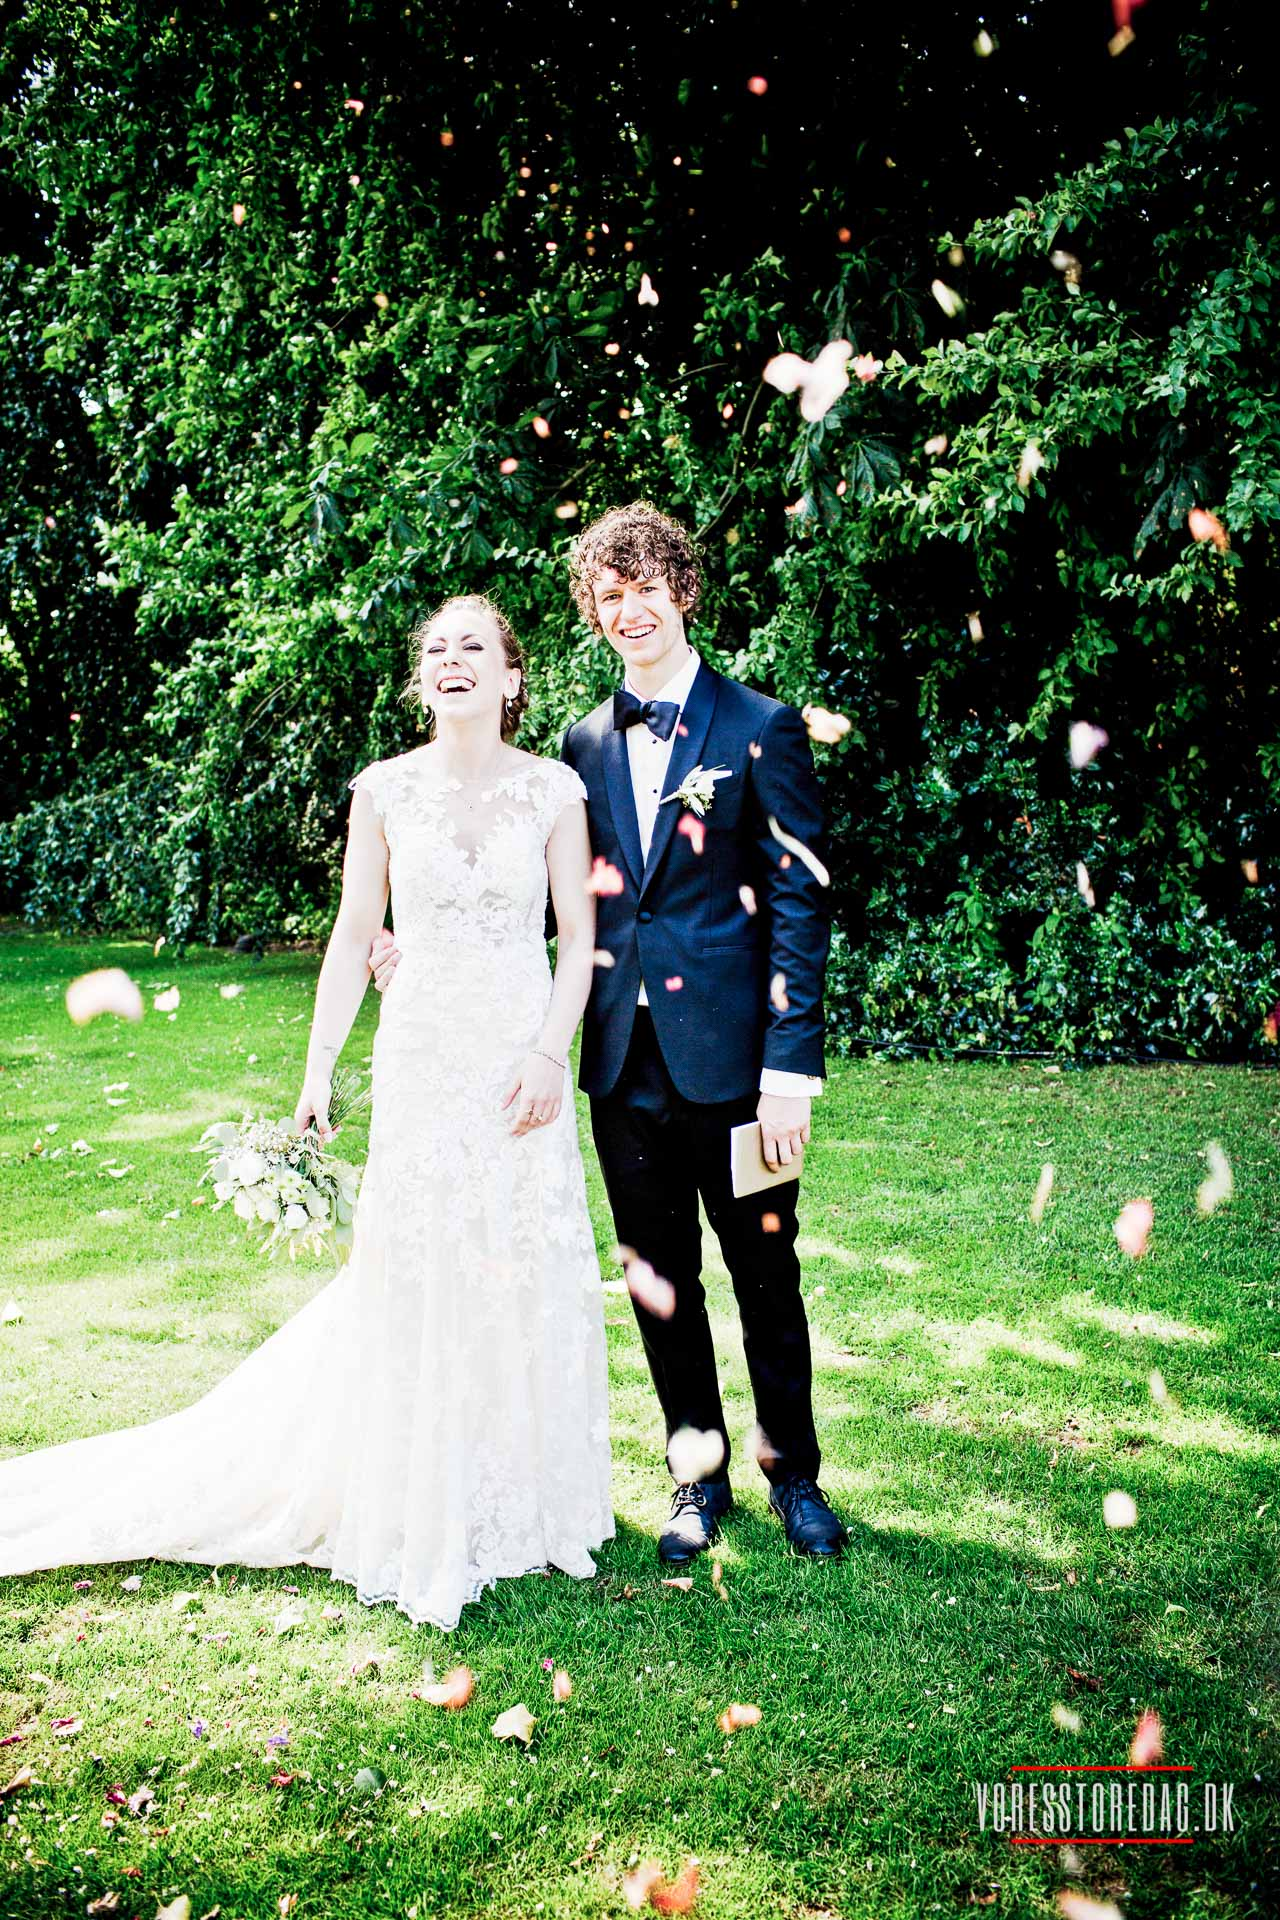 Bryllupsfotograf i Hobro · Bryllupsfoto Hobro · Bryllupsbilleder Hobro · Bryllup Hobro